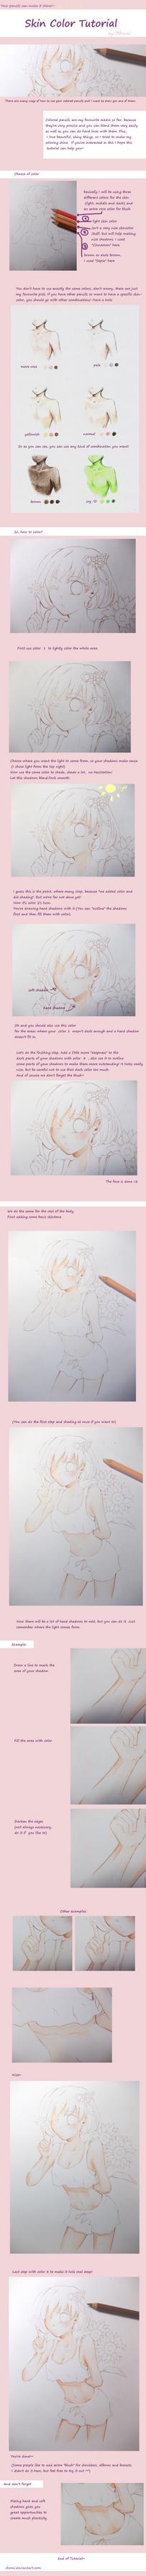 colored pencils- Skin Color Tutorial by Rhomi